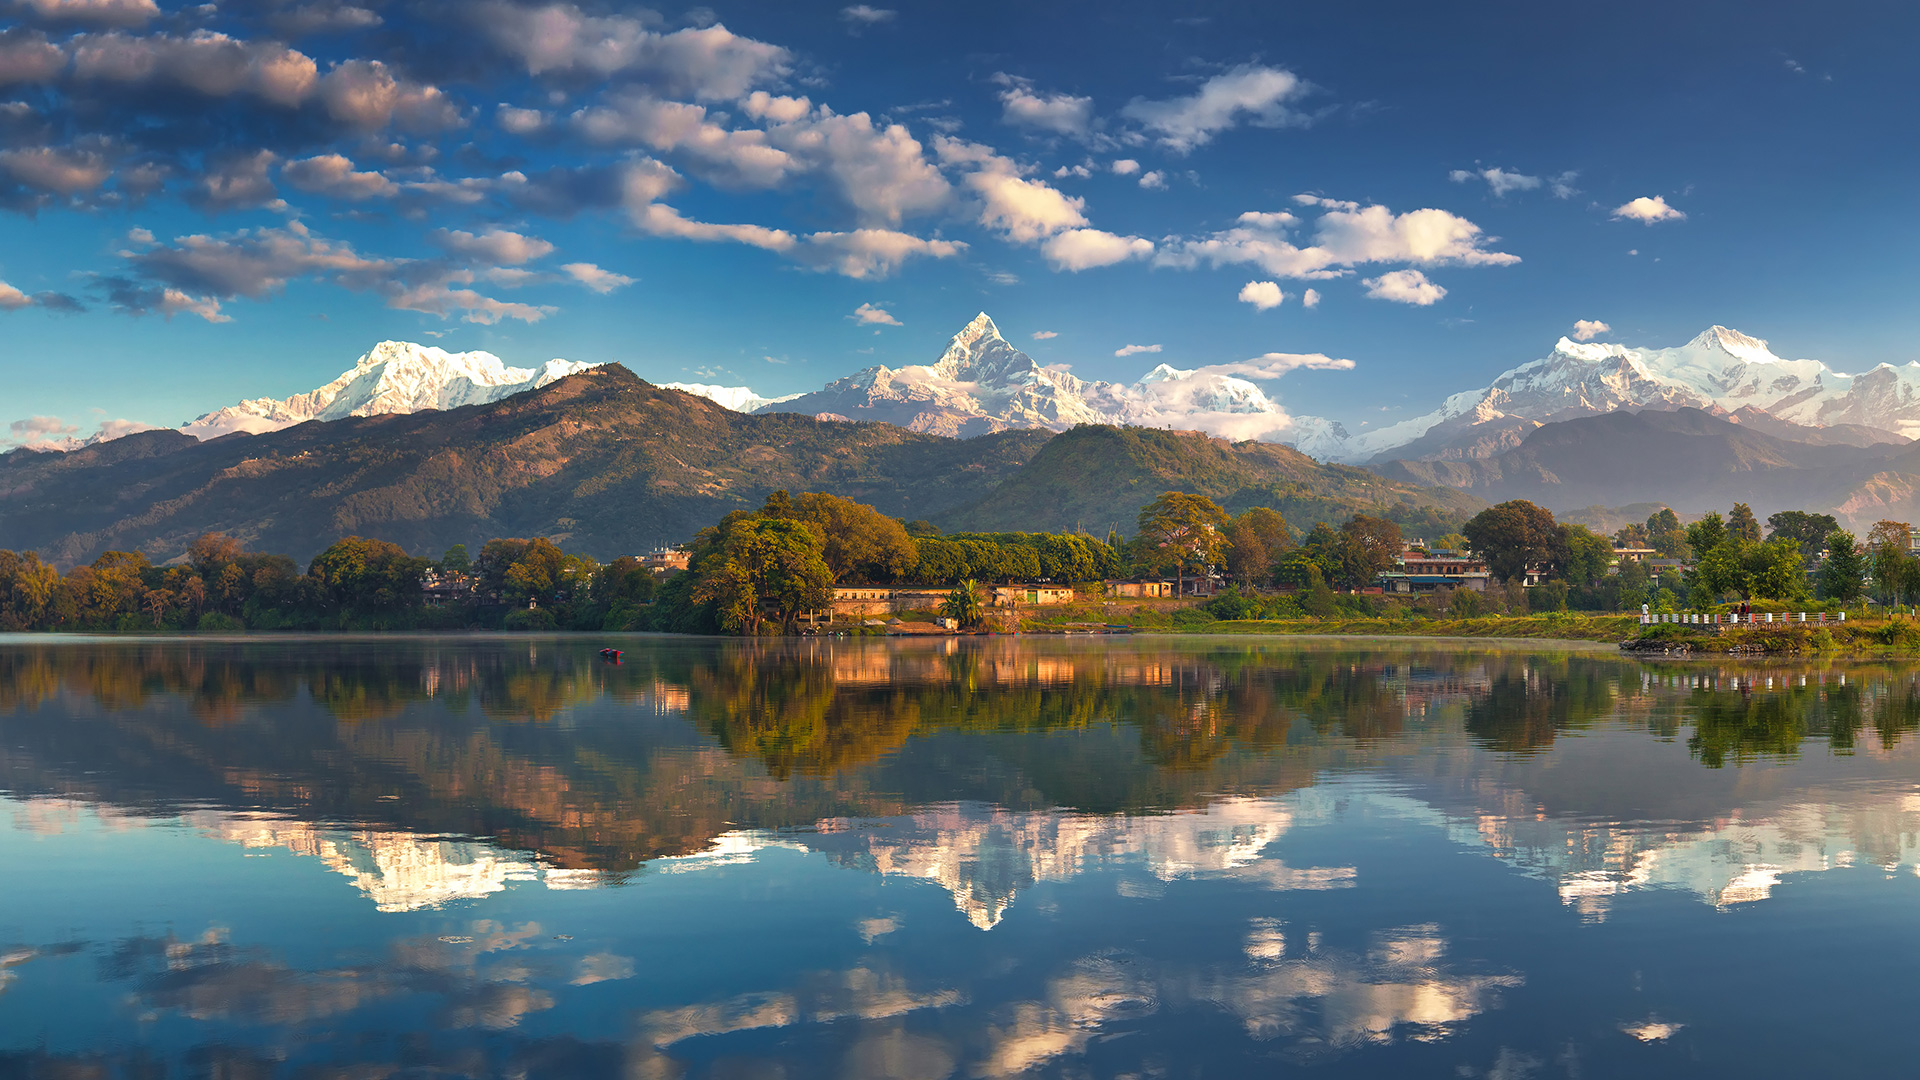 Country Fall Wallpaper Fishtail Lodge Pokhara Nepal ⋆ Hotel ⋆ Greaves India